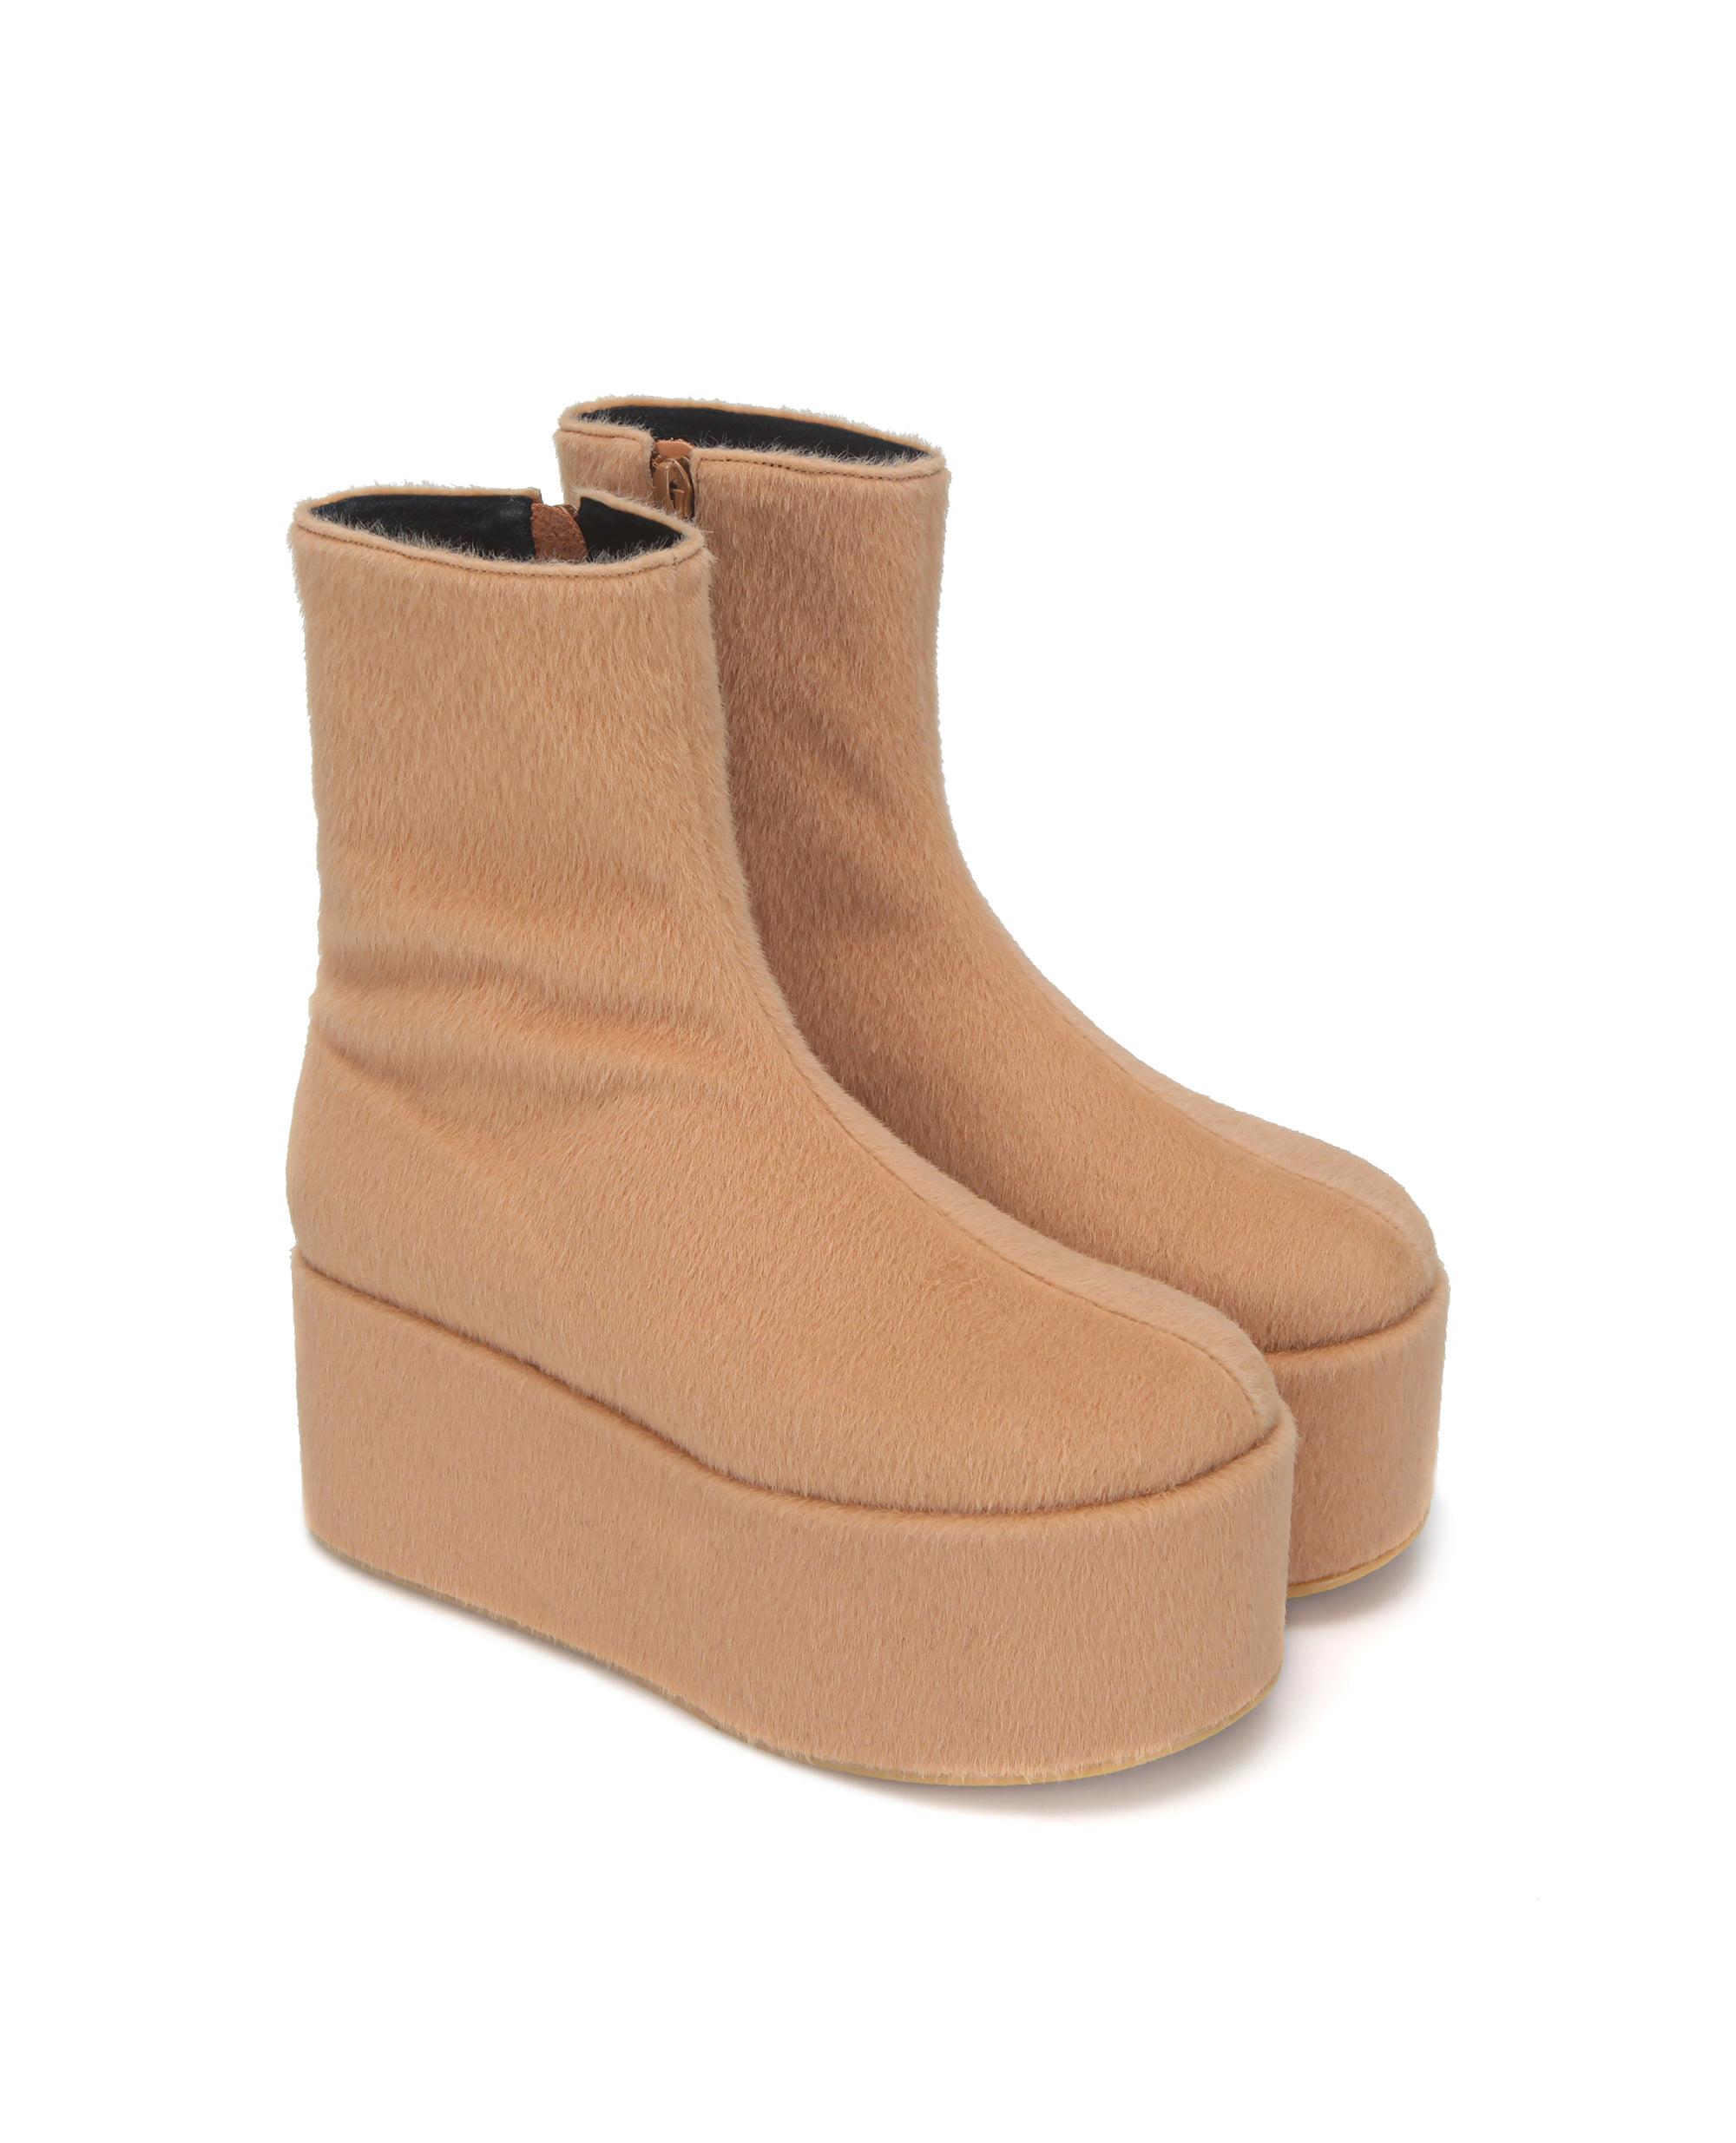 Pebble toe platform boots | Warm beige